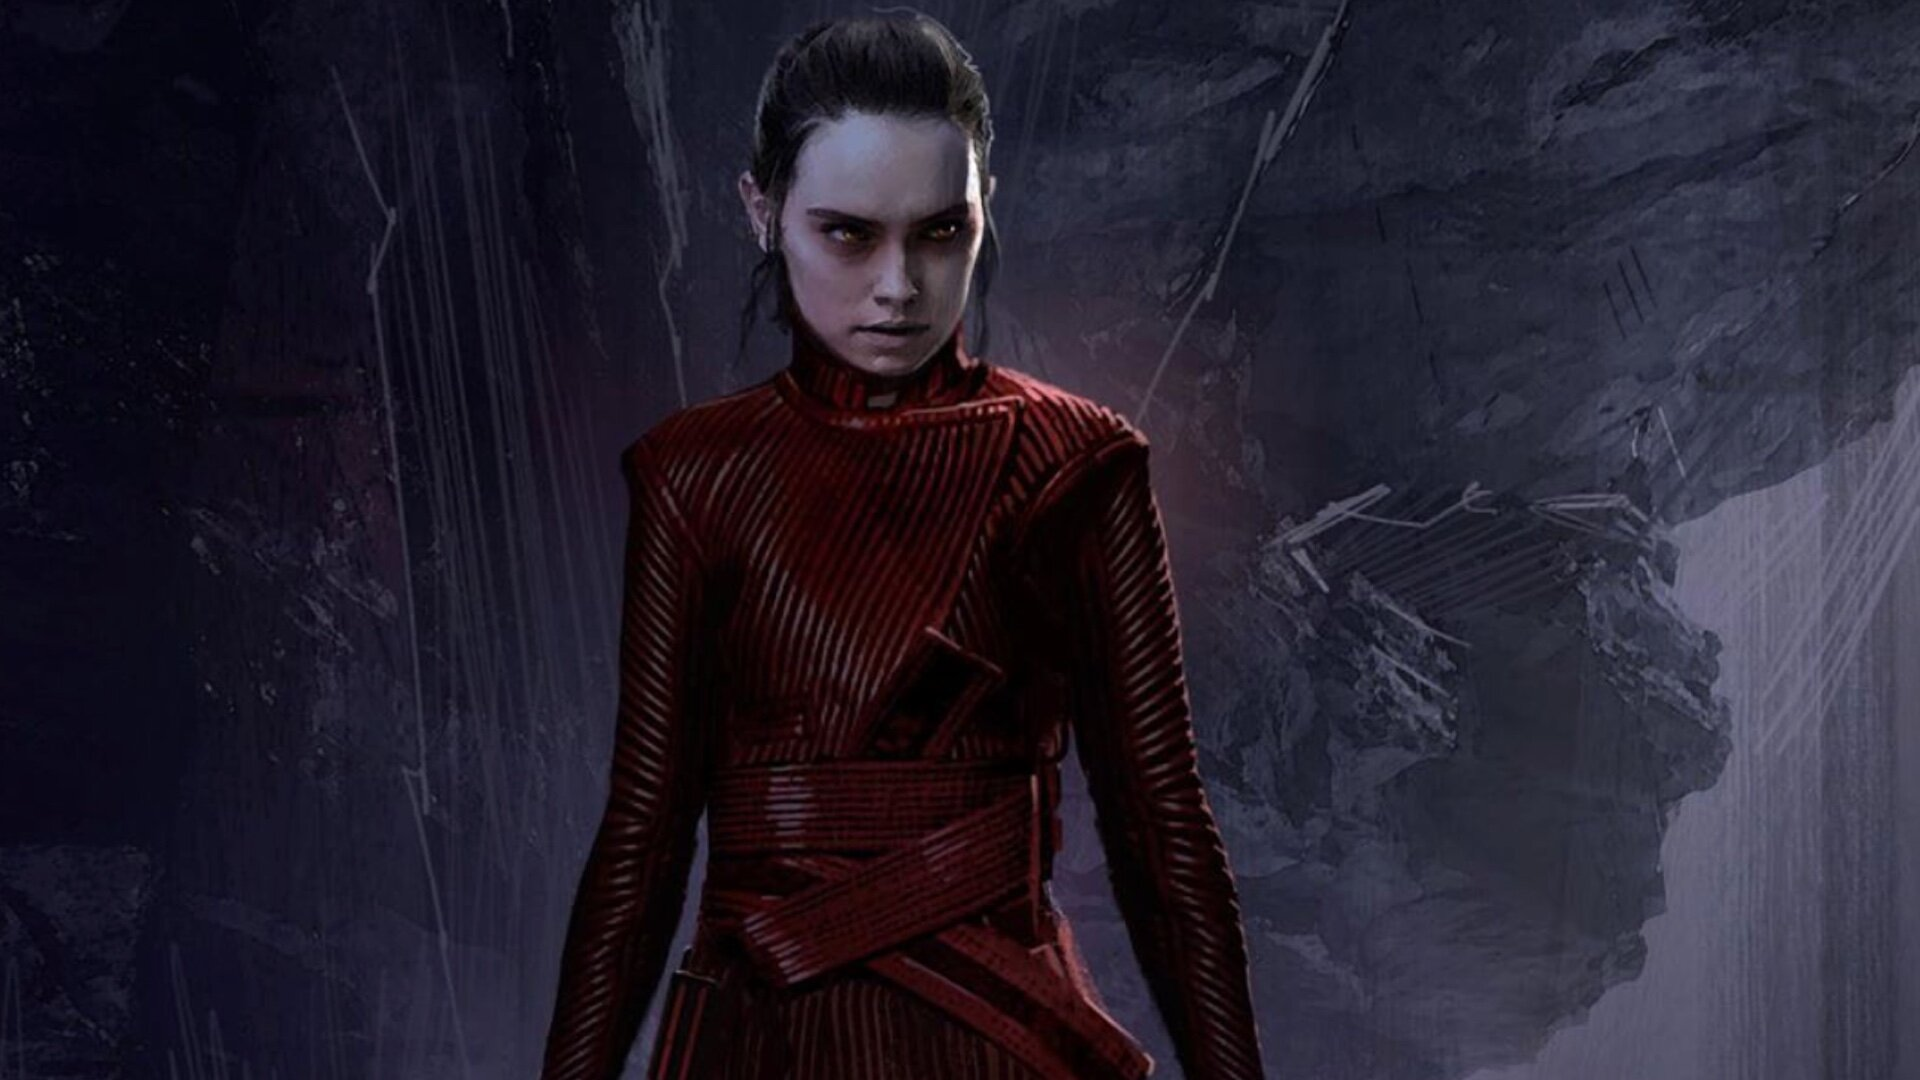 Star Wars The Rise Of Skywalker Concept Art Features Alternate Designs For Dark Rey Geektyrant